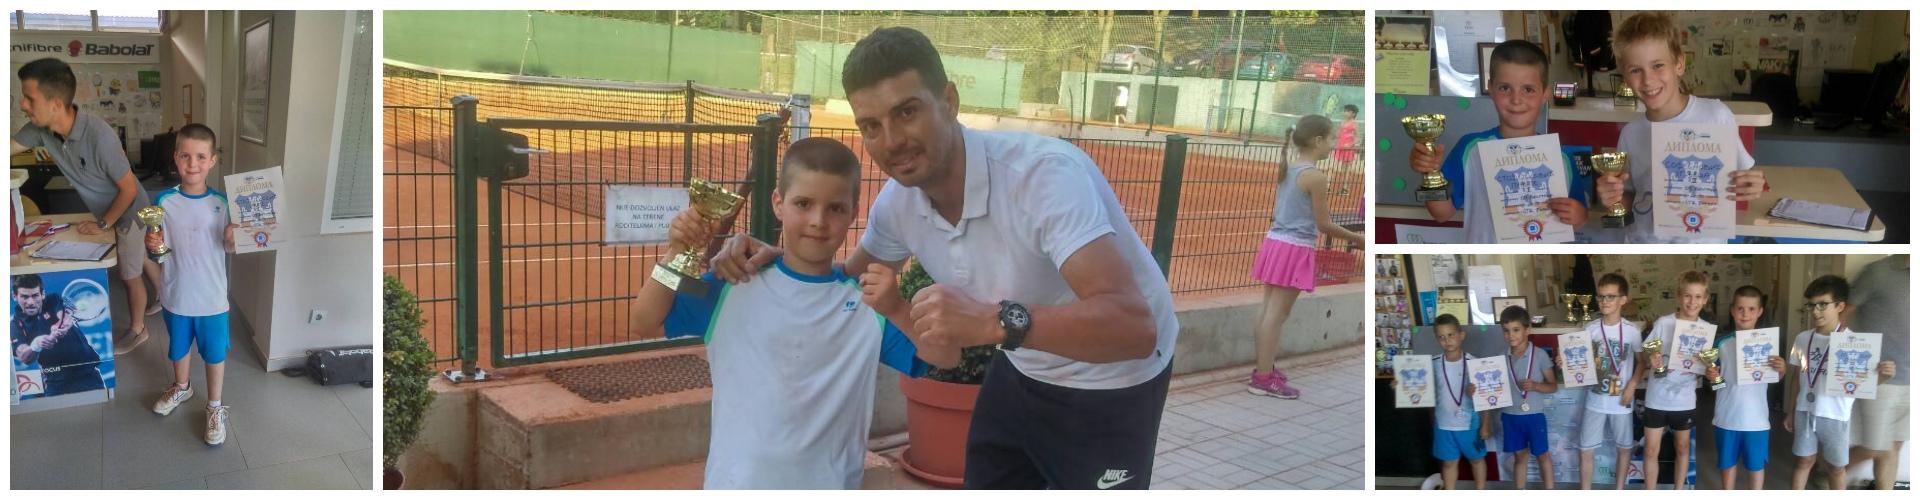 Pavle Stojiljković (TK Šumice) osvojio OP Beograda - narandžasti nivo